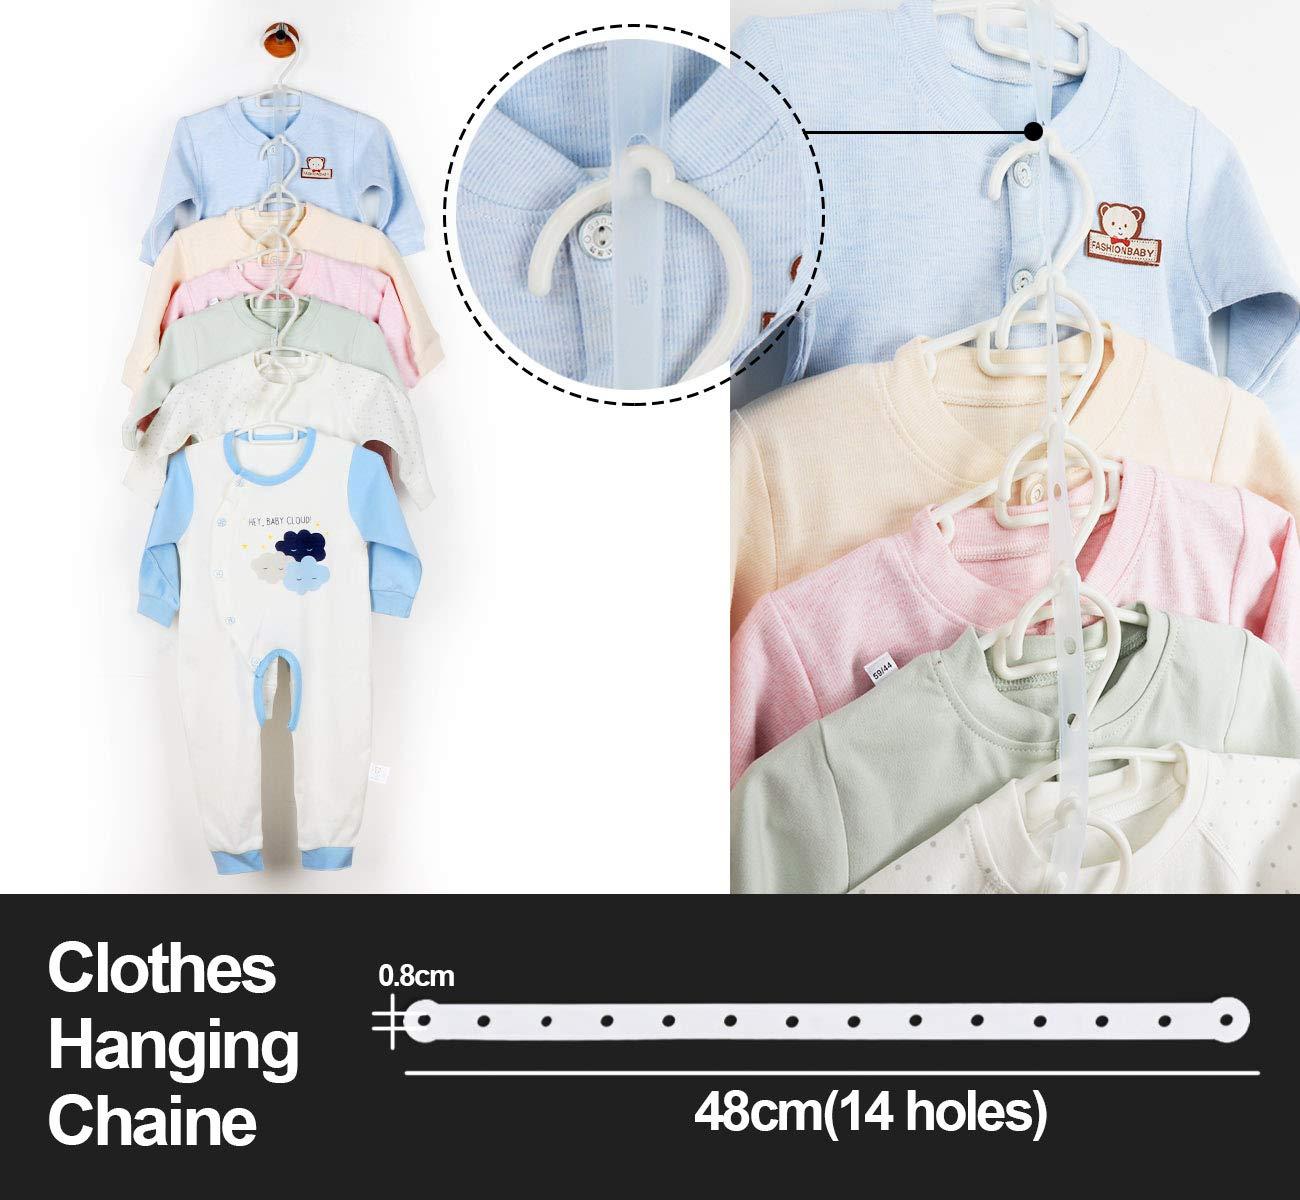 Baby Clothes Hangers Eisblau Bieco Kleiderb/ügel Kinder 32 St Kunststoff Kleiderb/ügel Kinder Baby Baby Kleiderb/ügel Baby Organiser F/ür Kleiderschrank Kleiderb/ügel Baby L/änge ca 30 cm